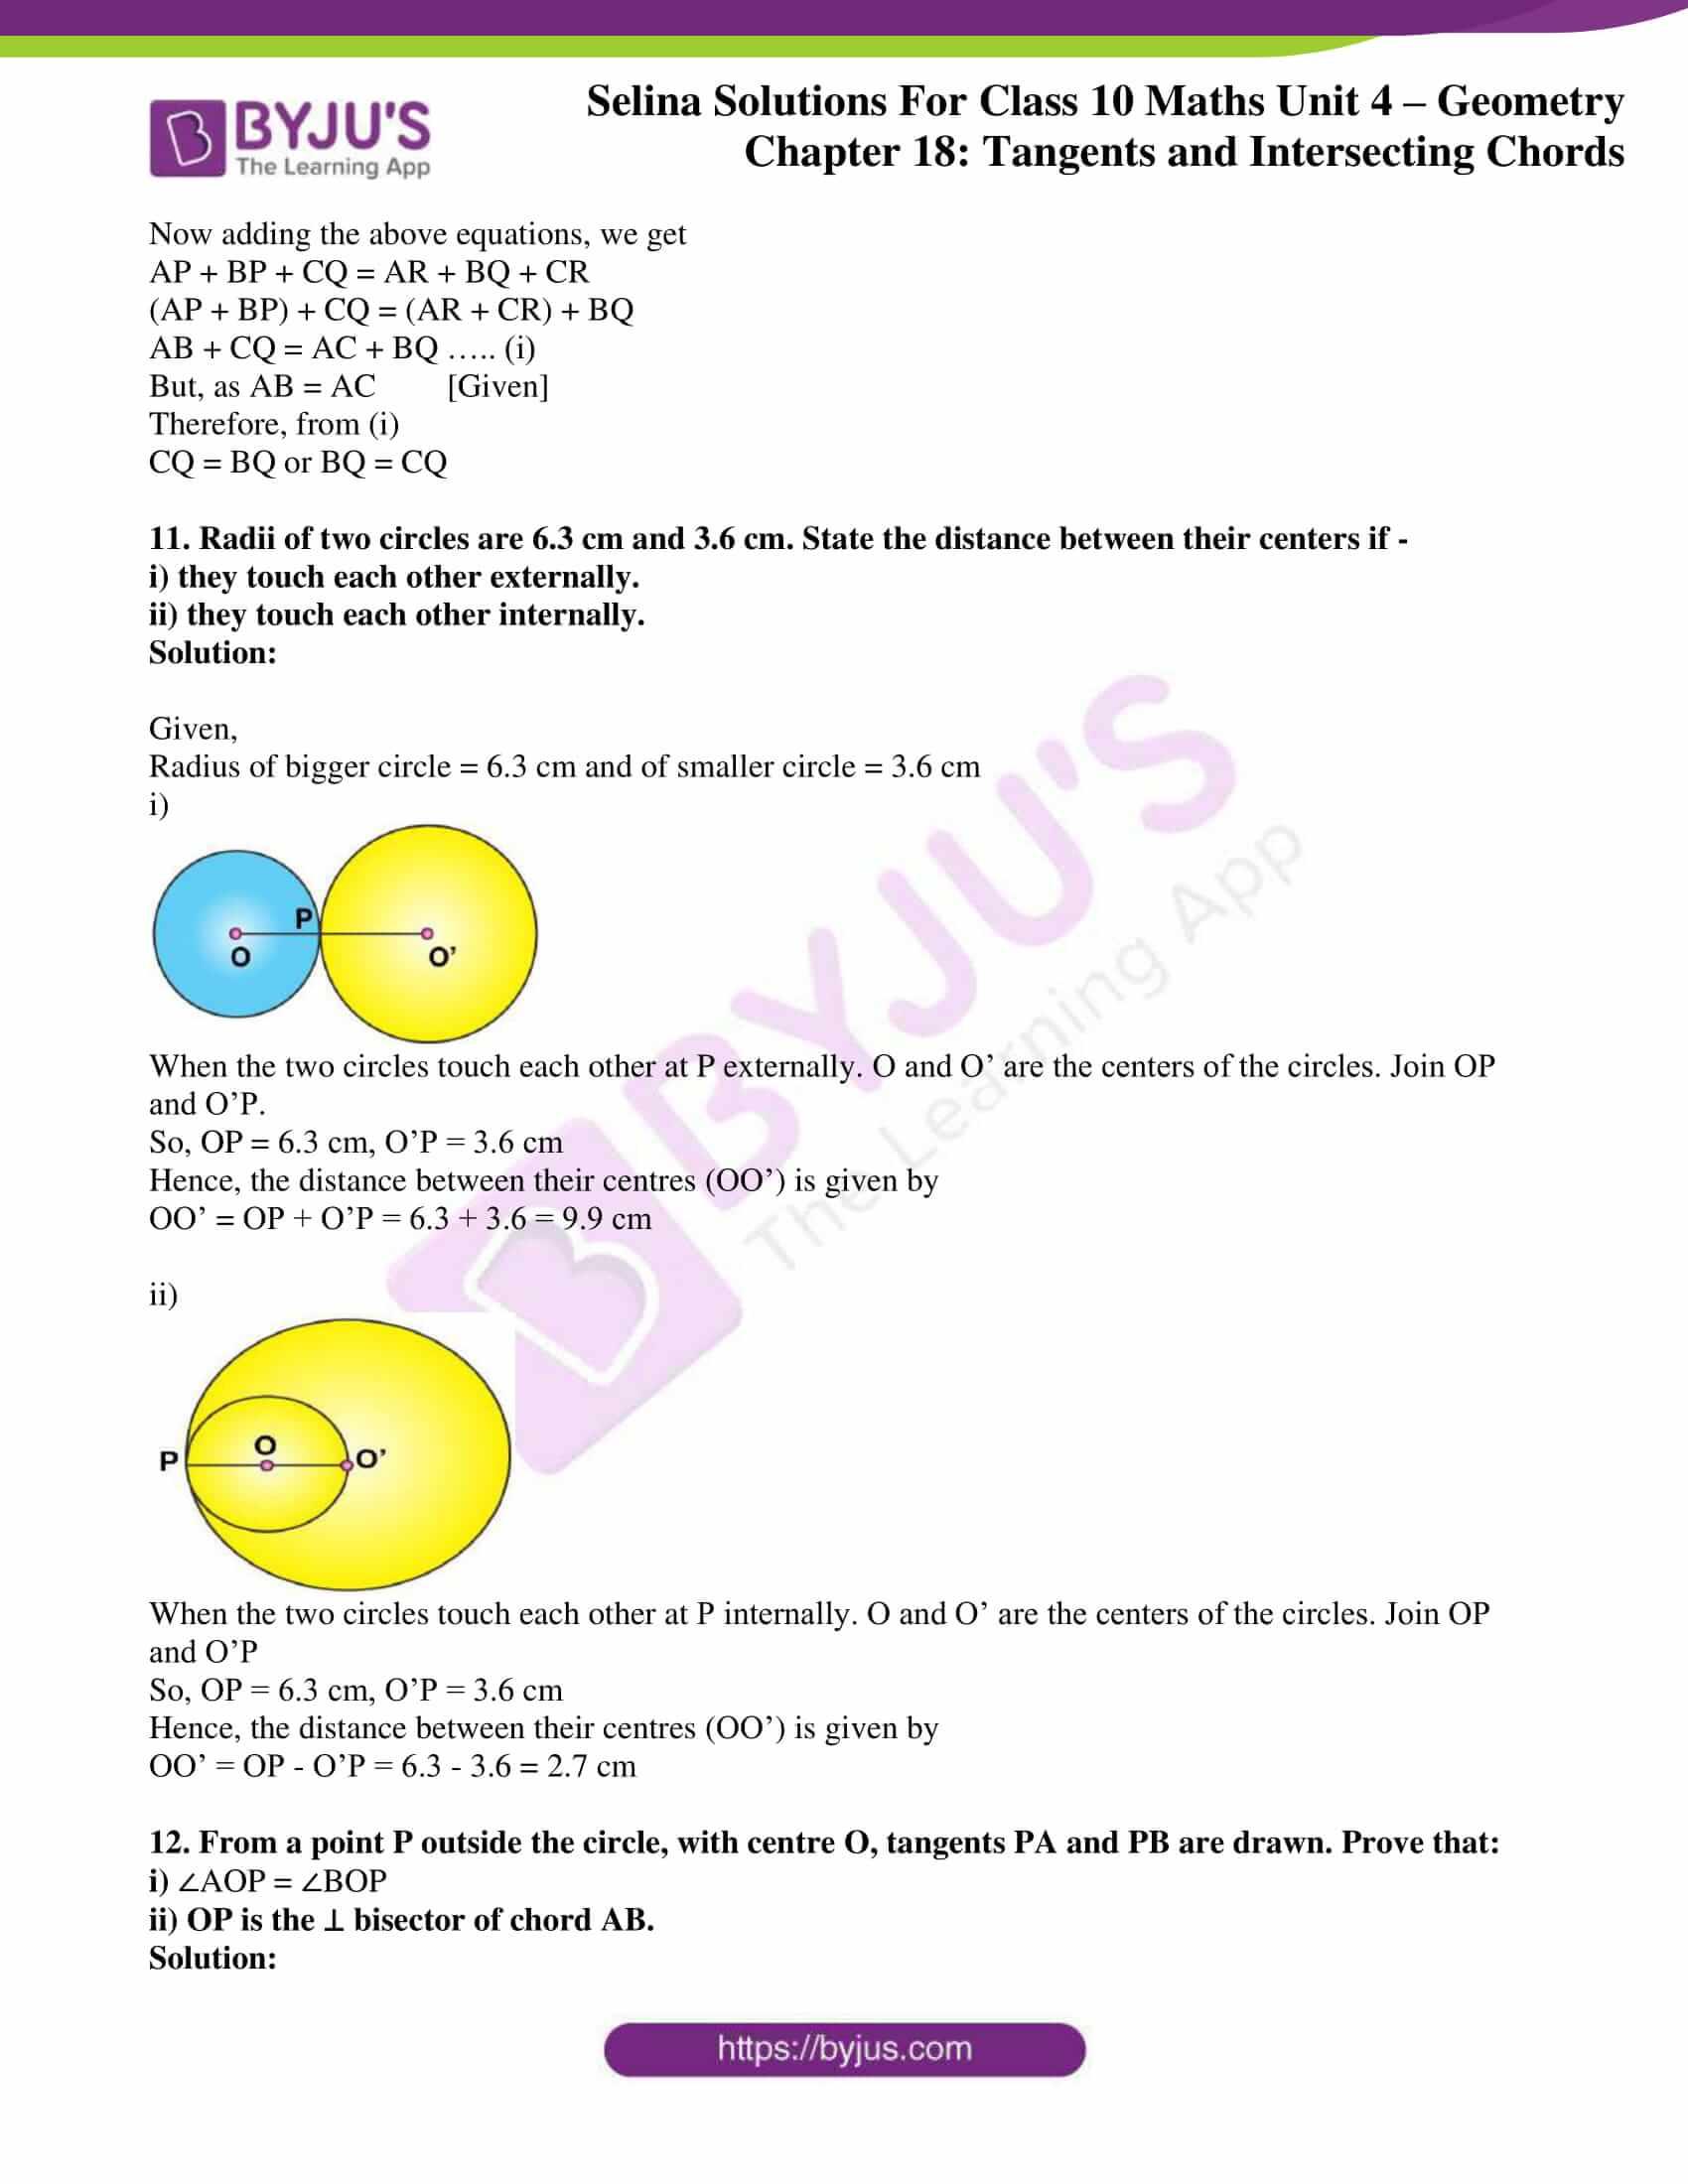 selina-sol-maths-class-10-ch-18-ex-a-6